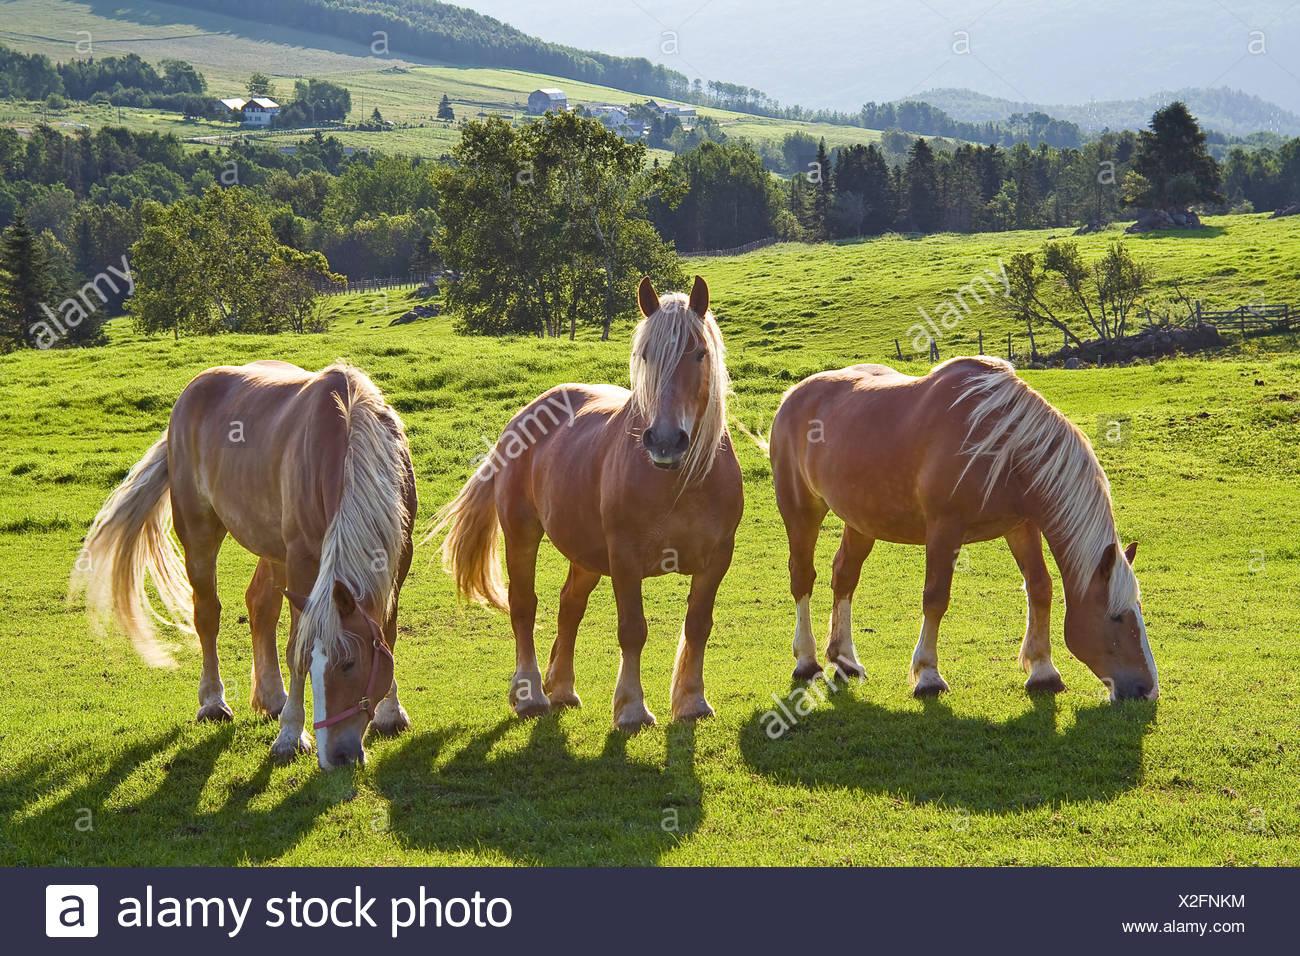 Three Belgian American draft horses in a pasture. - Stock Image